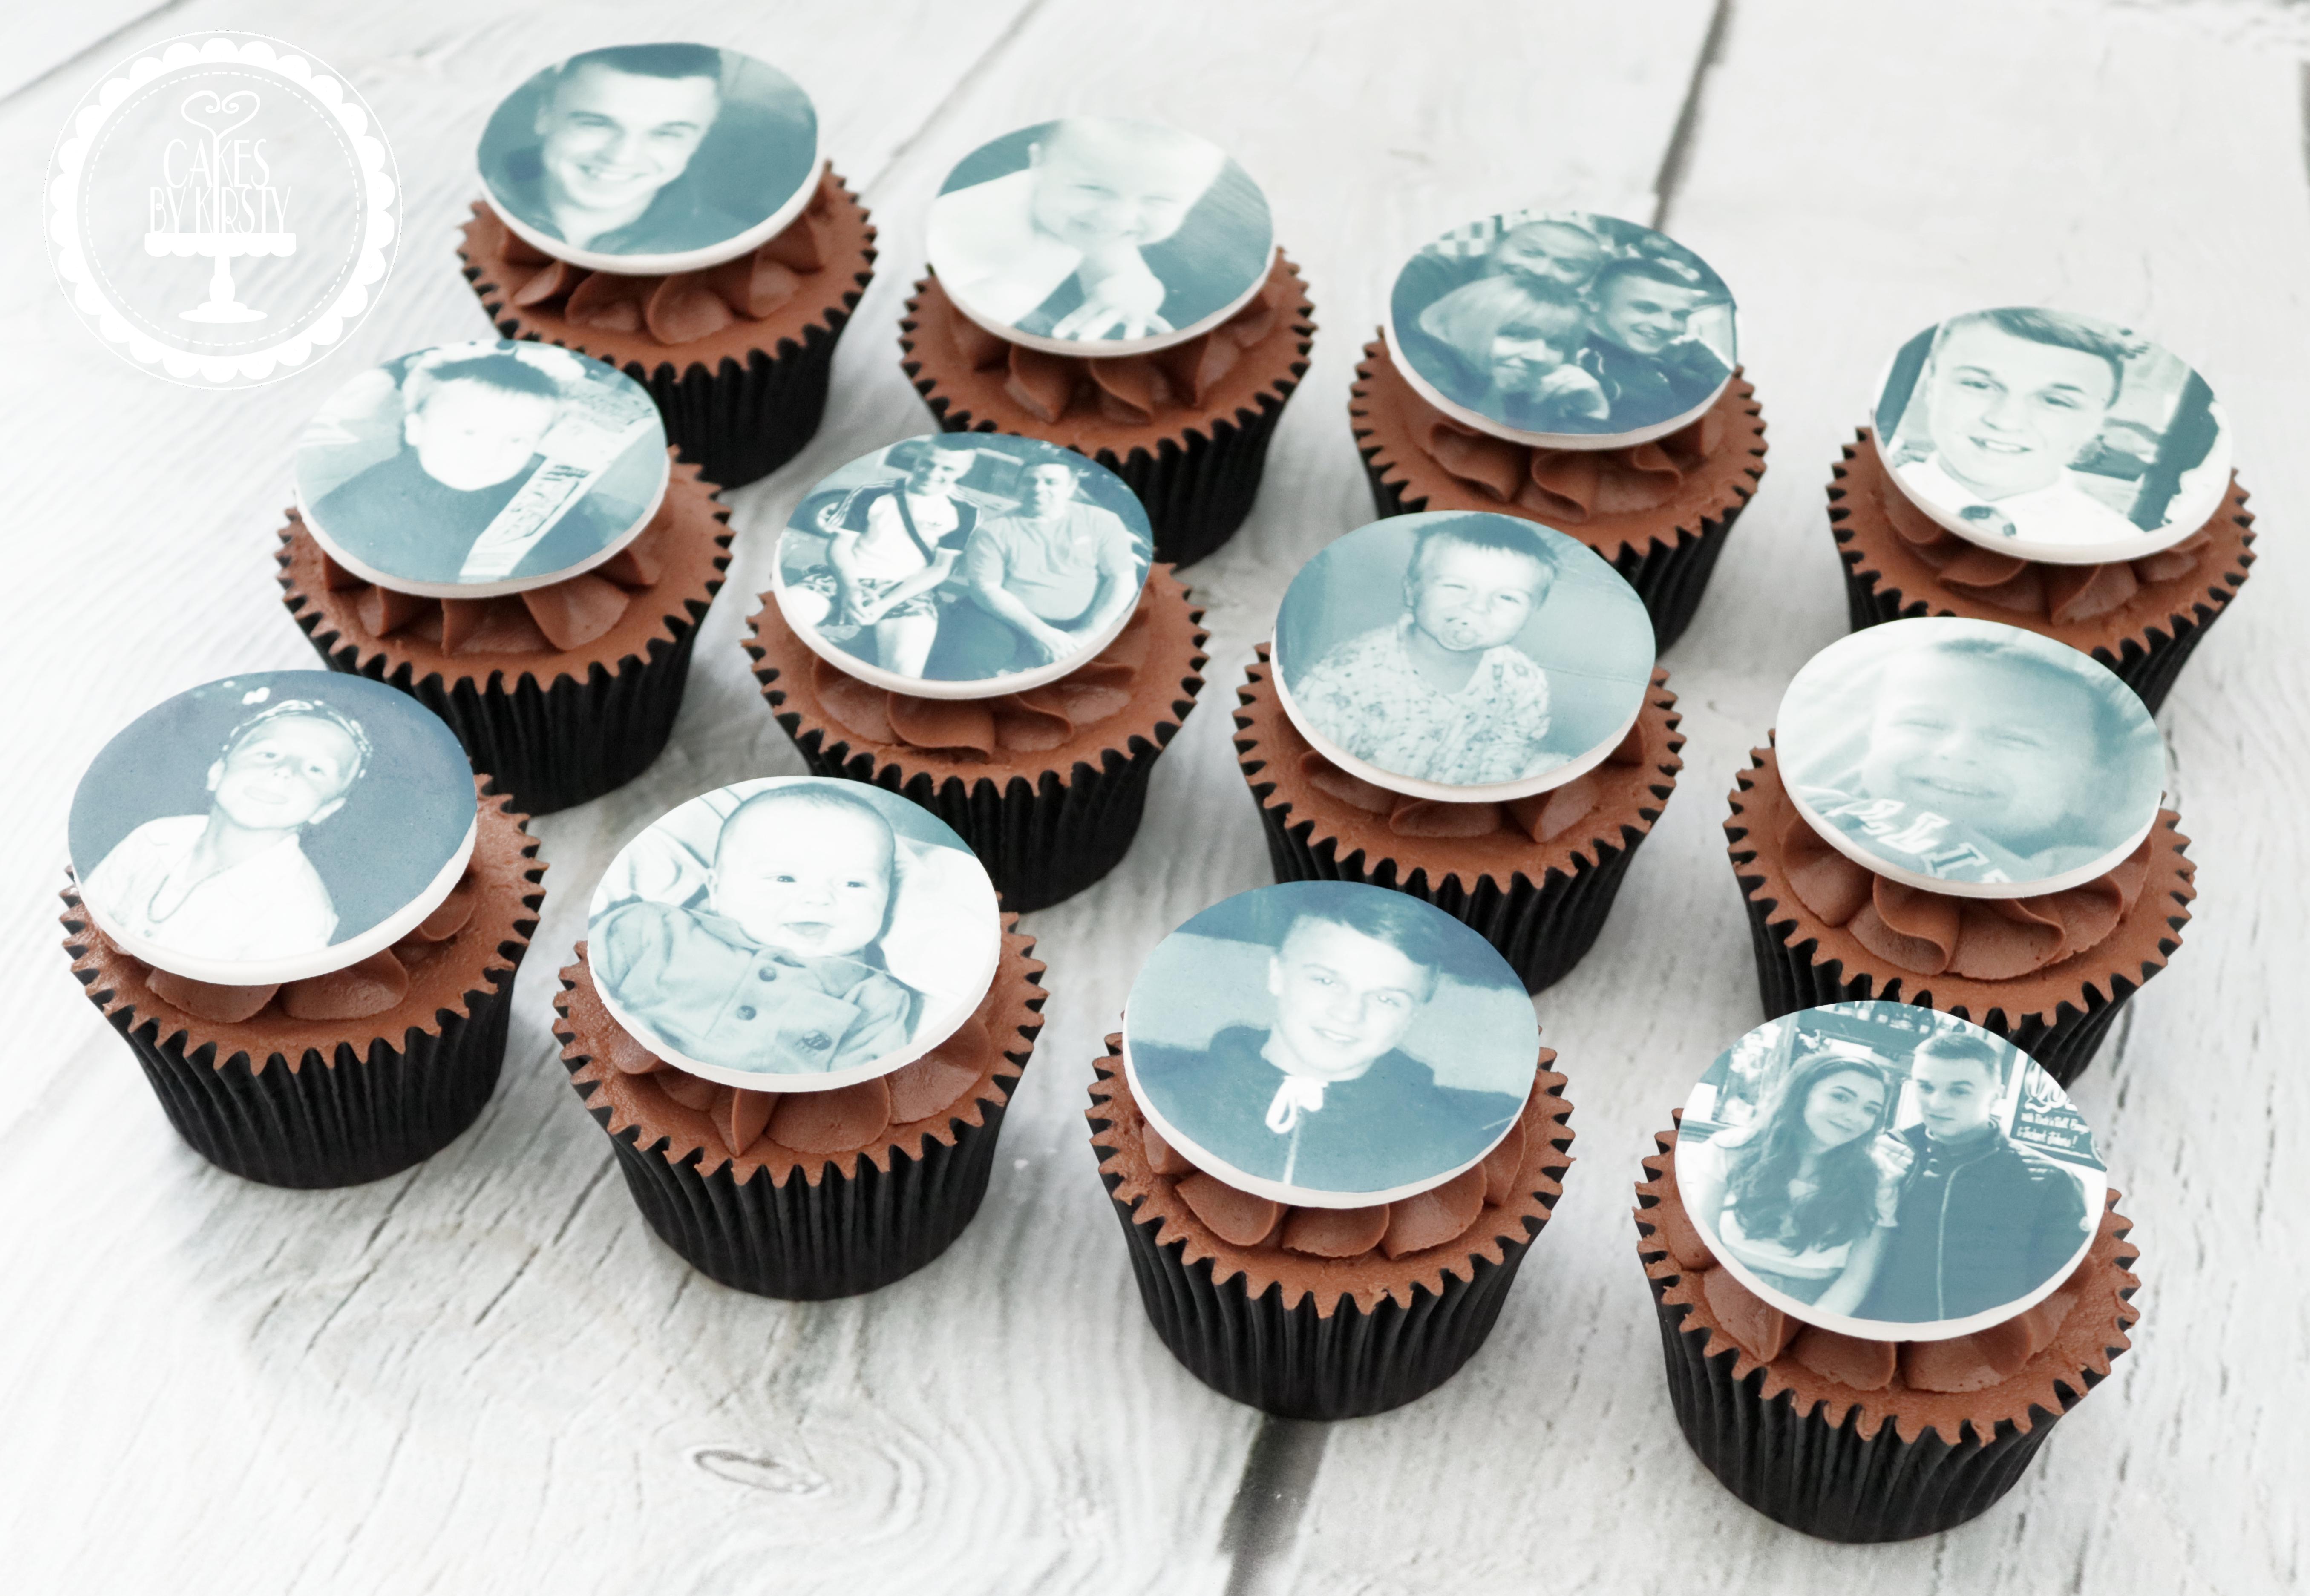 20190803 - Edible Image Cupcakes